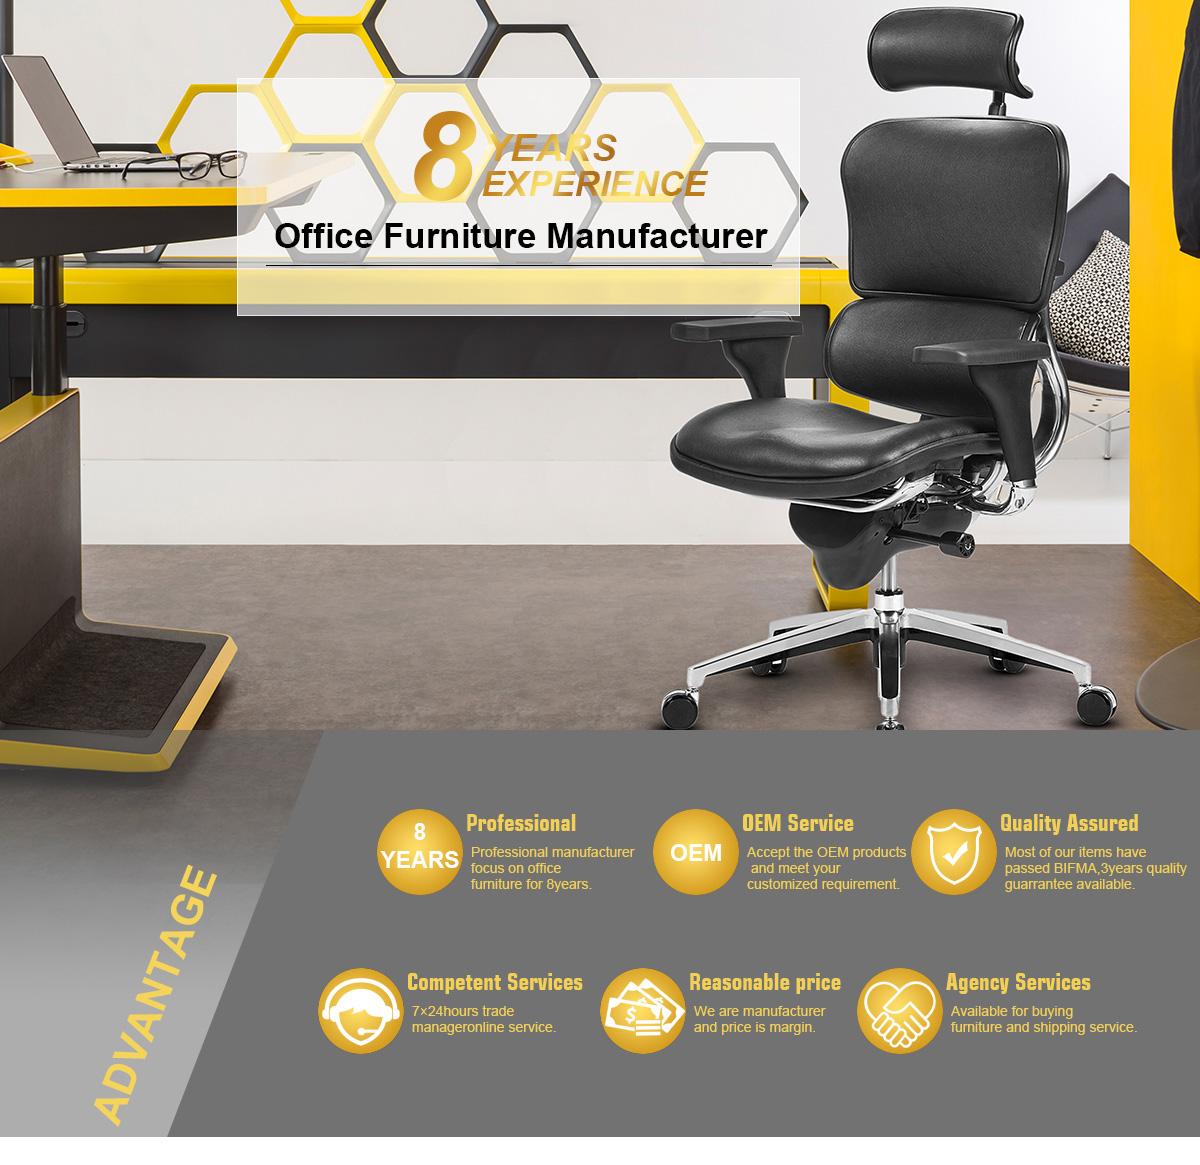 foshan bonas furniture co ltd office furniture office chair